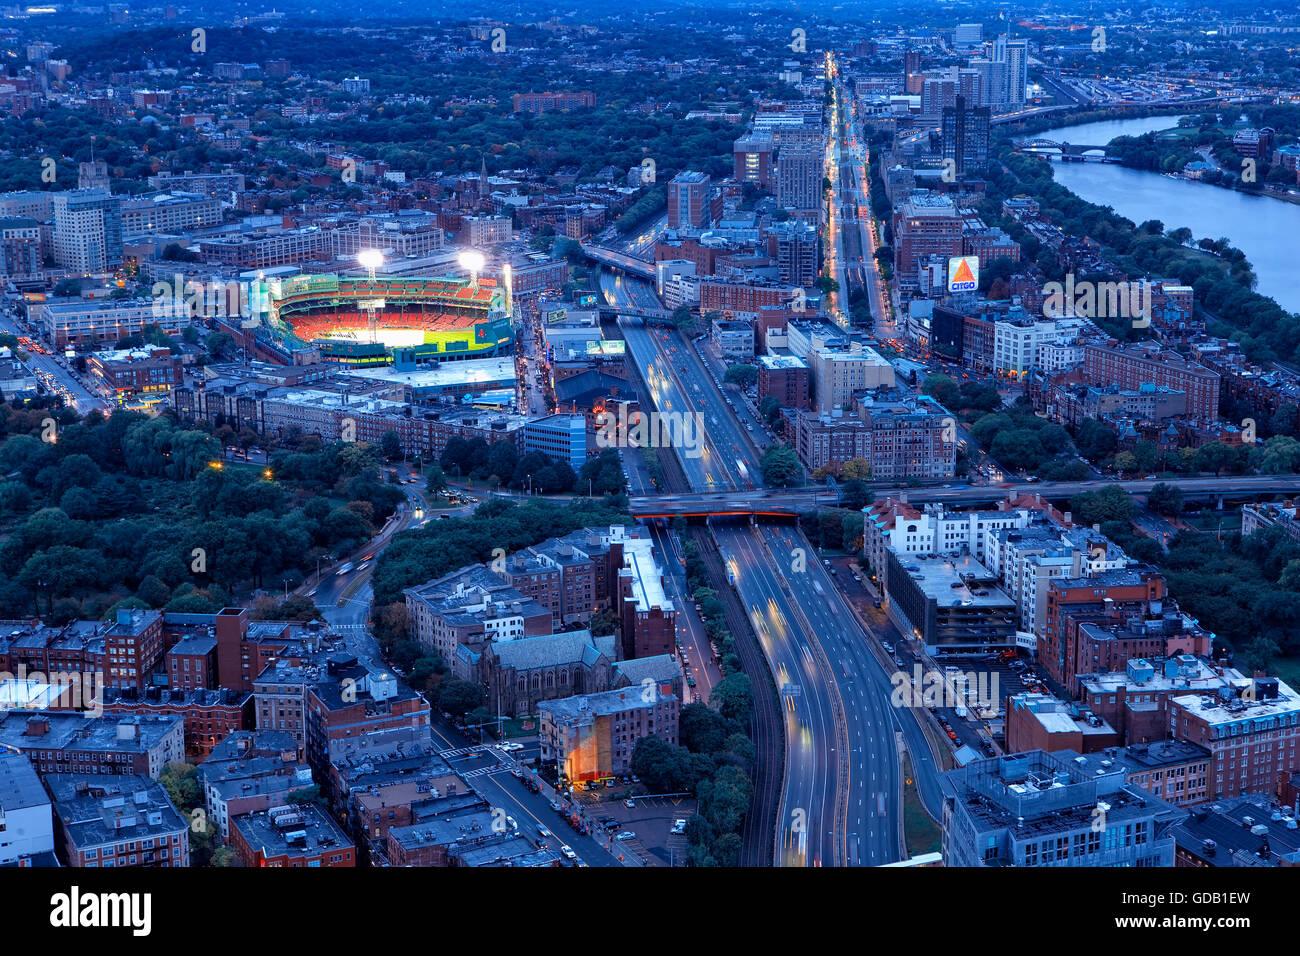 Boston und Base-Ball-Stadion bei Nacht Stockbild